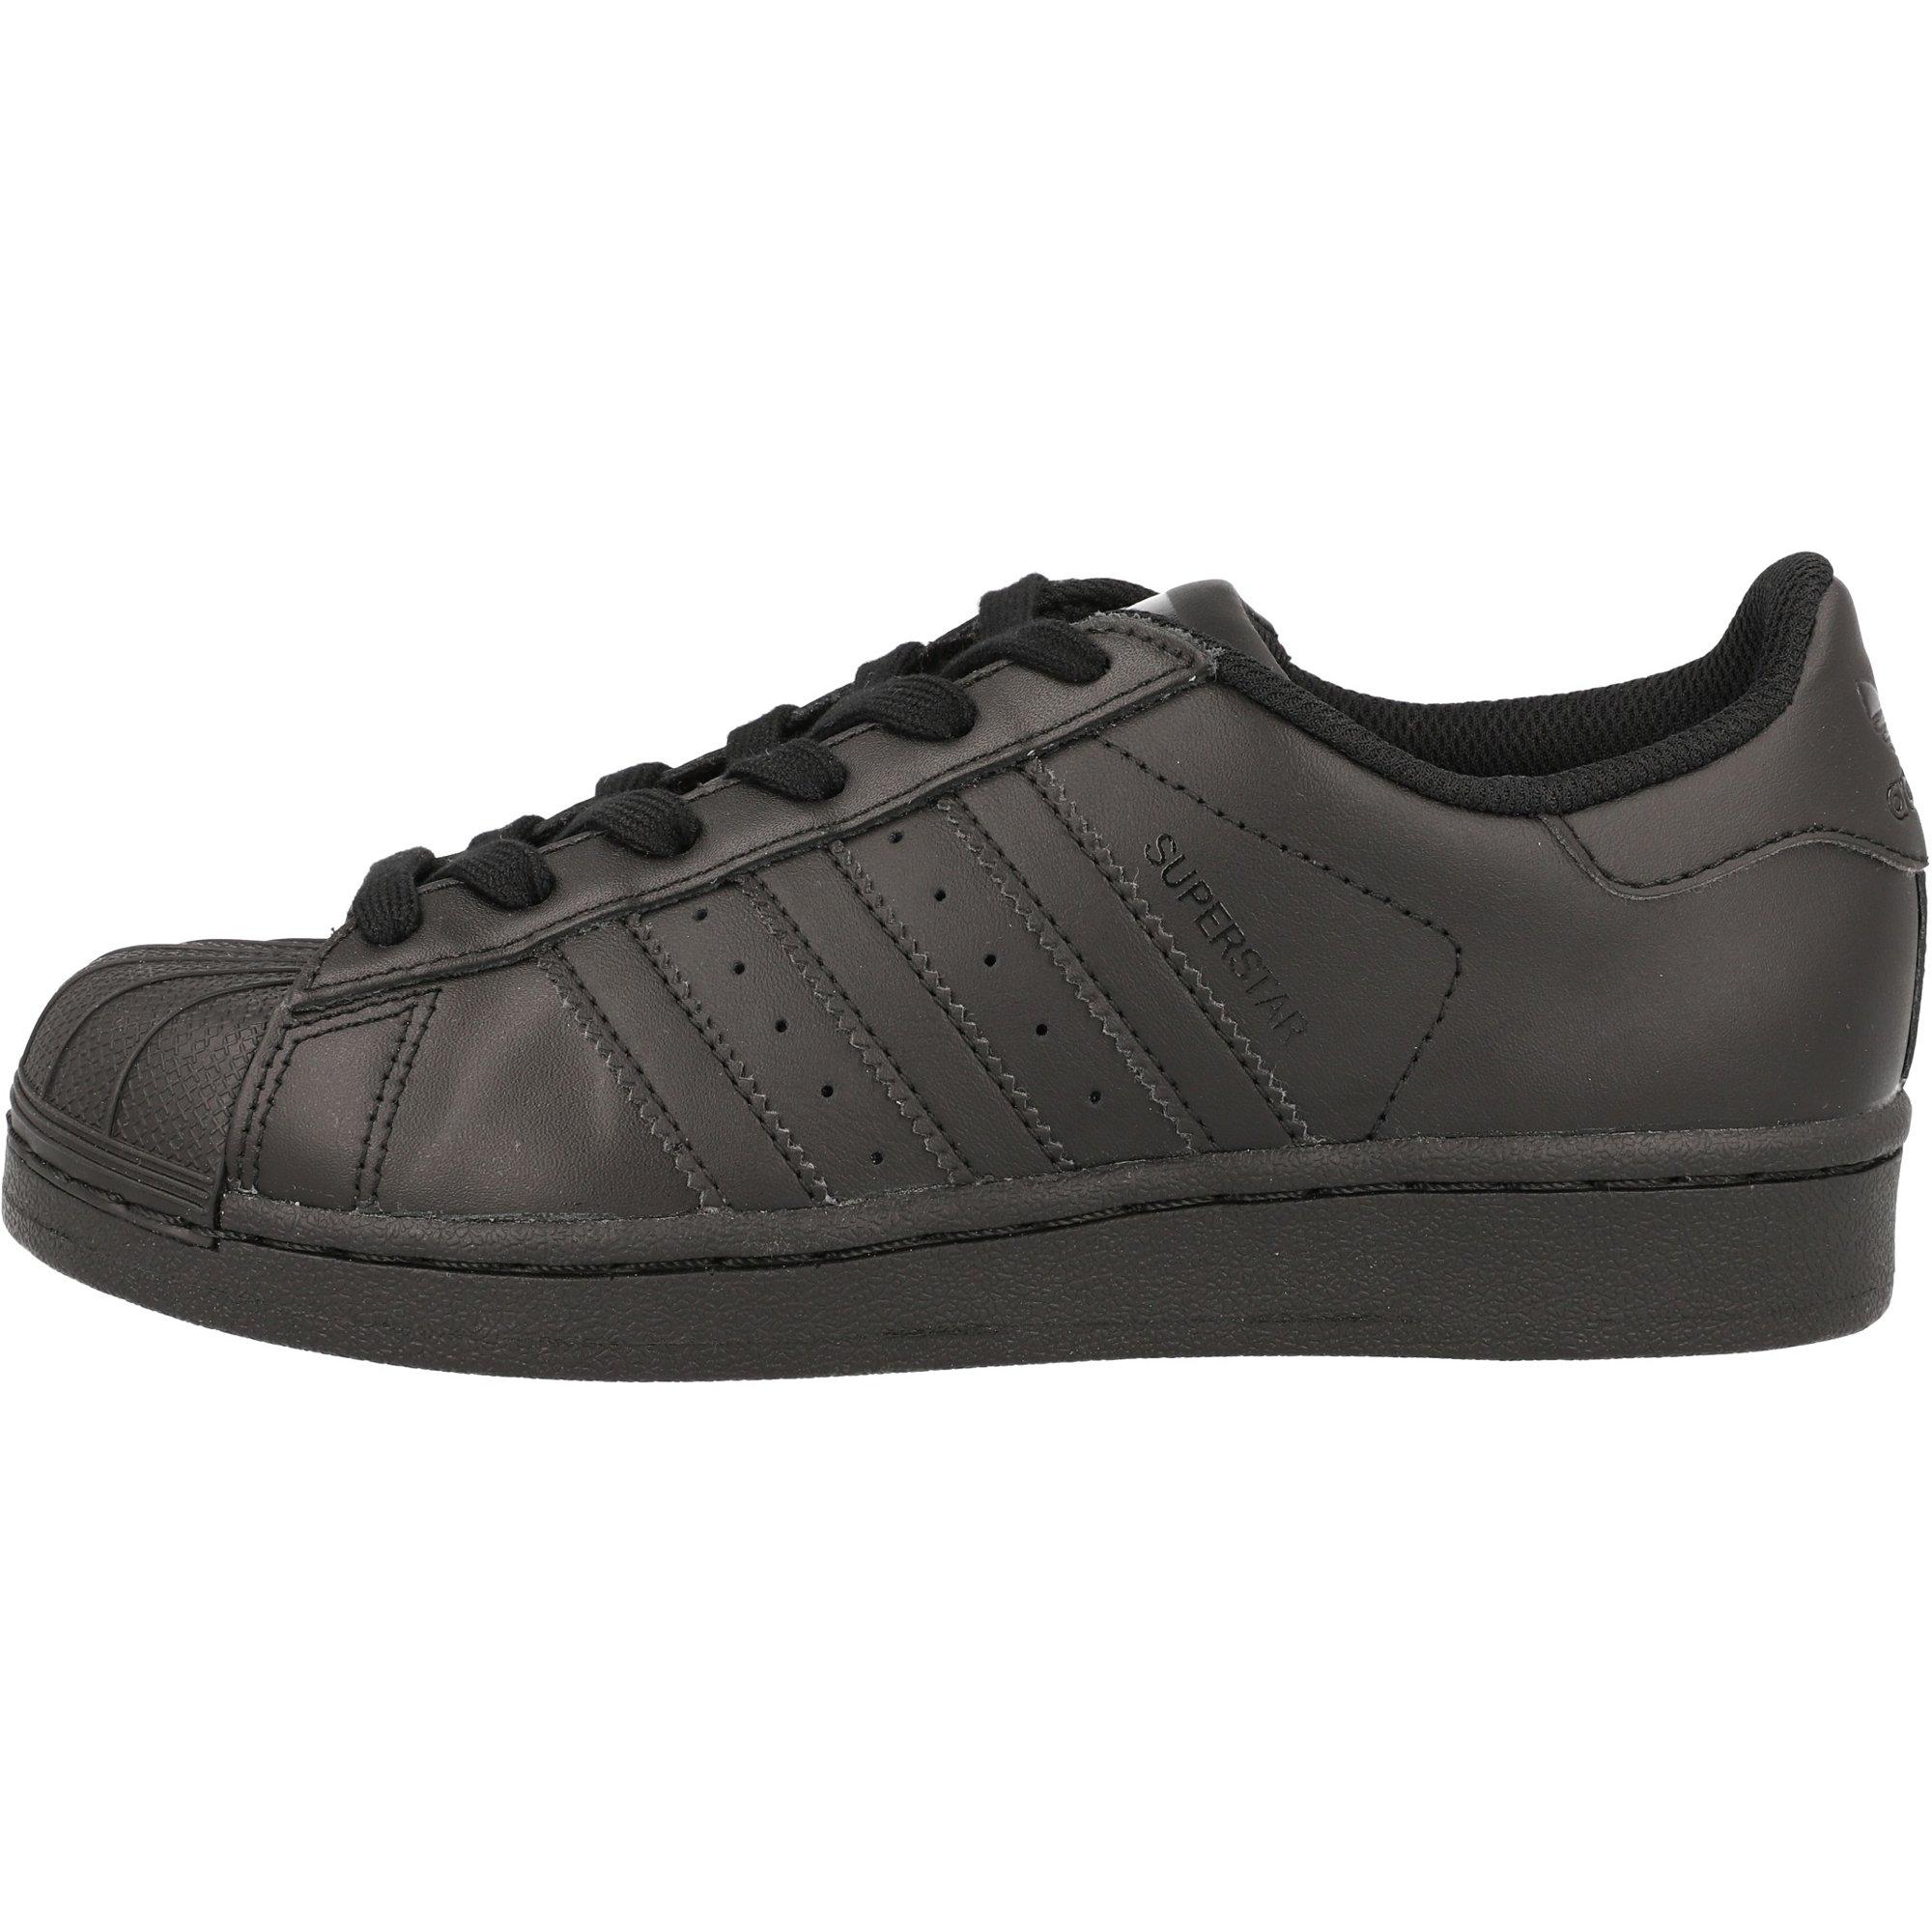 adidas Originals Superstar Foundation J Black Leather